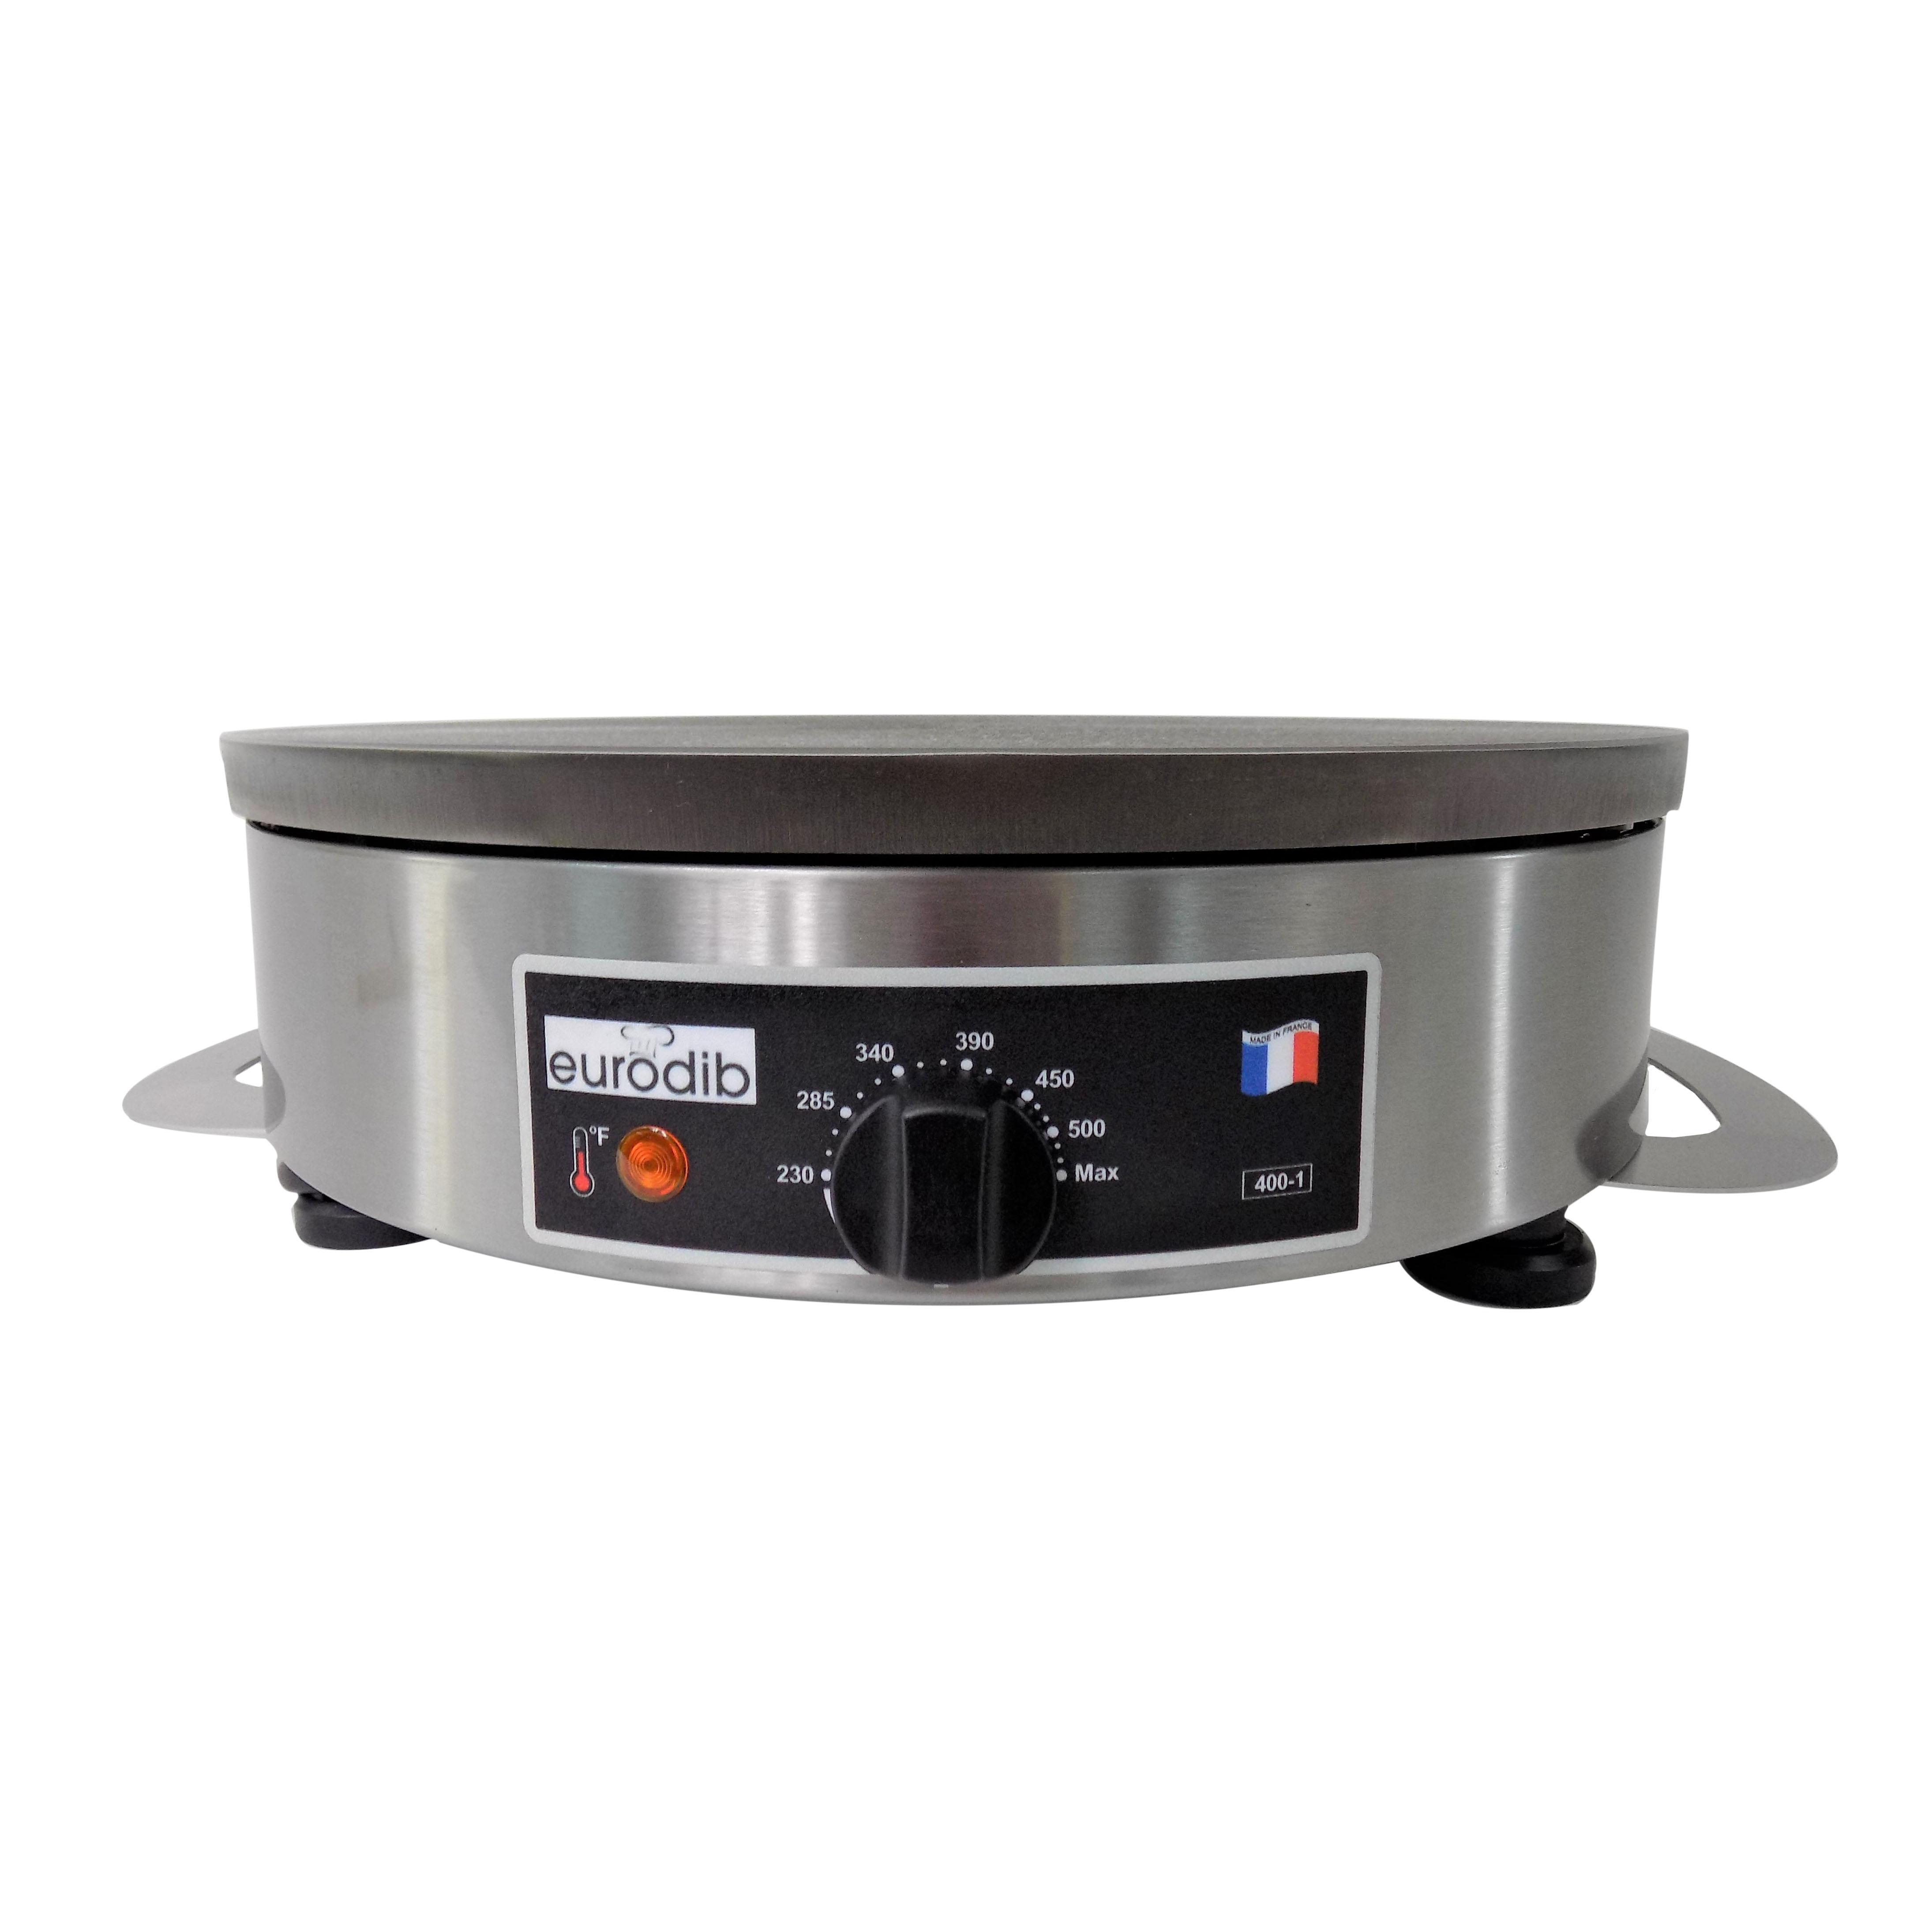 Eurodib USA CEEB41-120 crepe maker